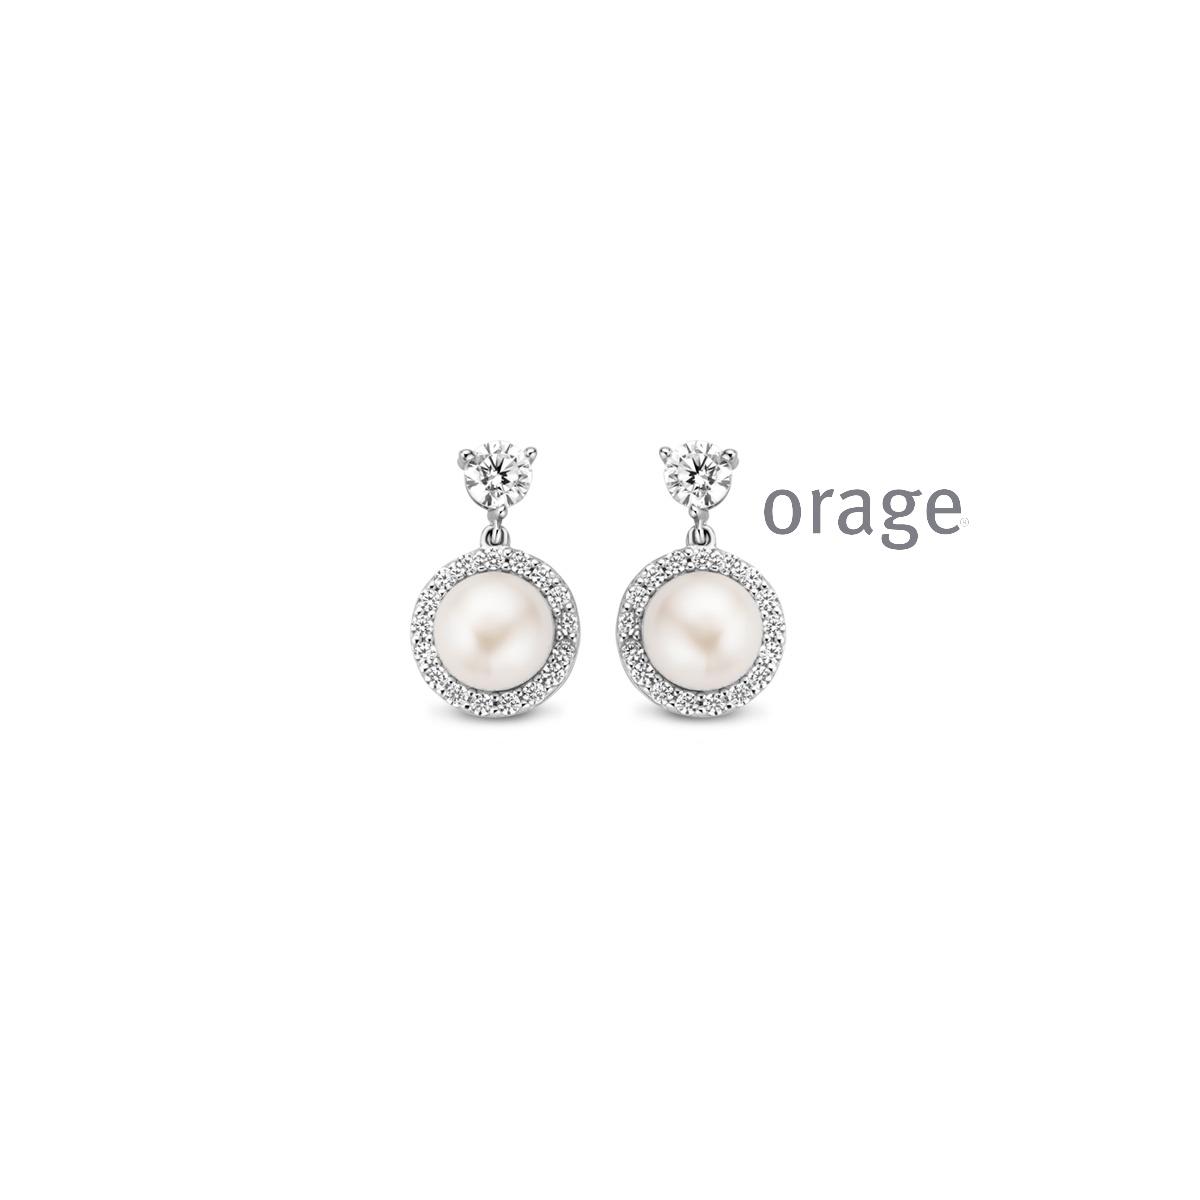 Orage AR104 oorbellen zilver met parel